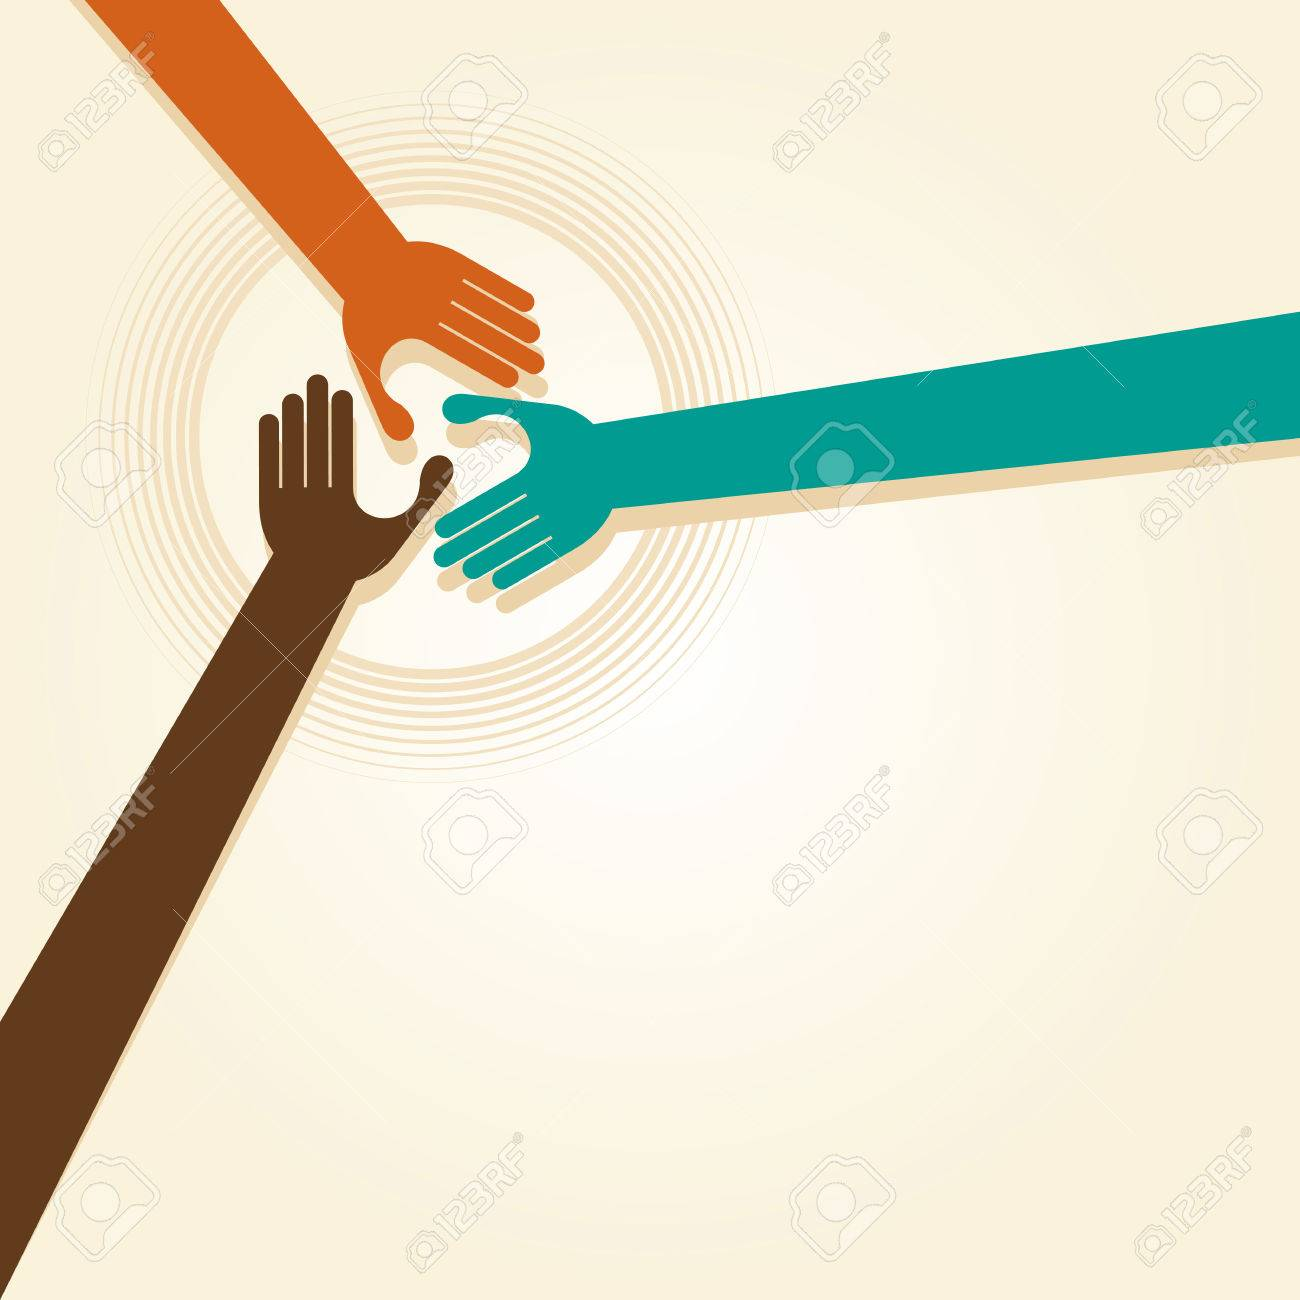 Handshake, Teamwork Hands Logo. Vector illustration. Standard-Bild - 37076542